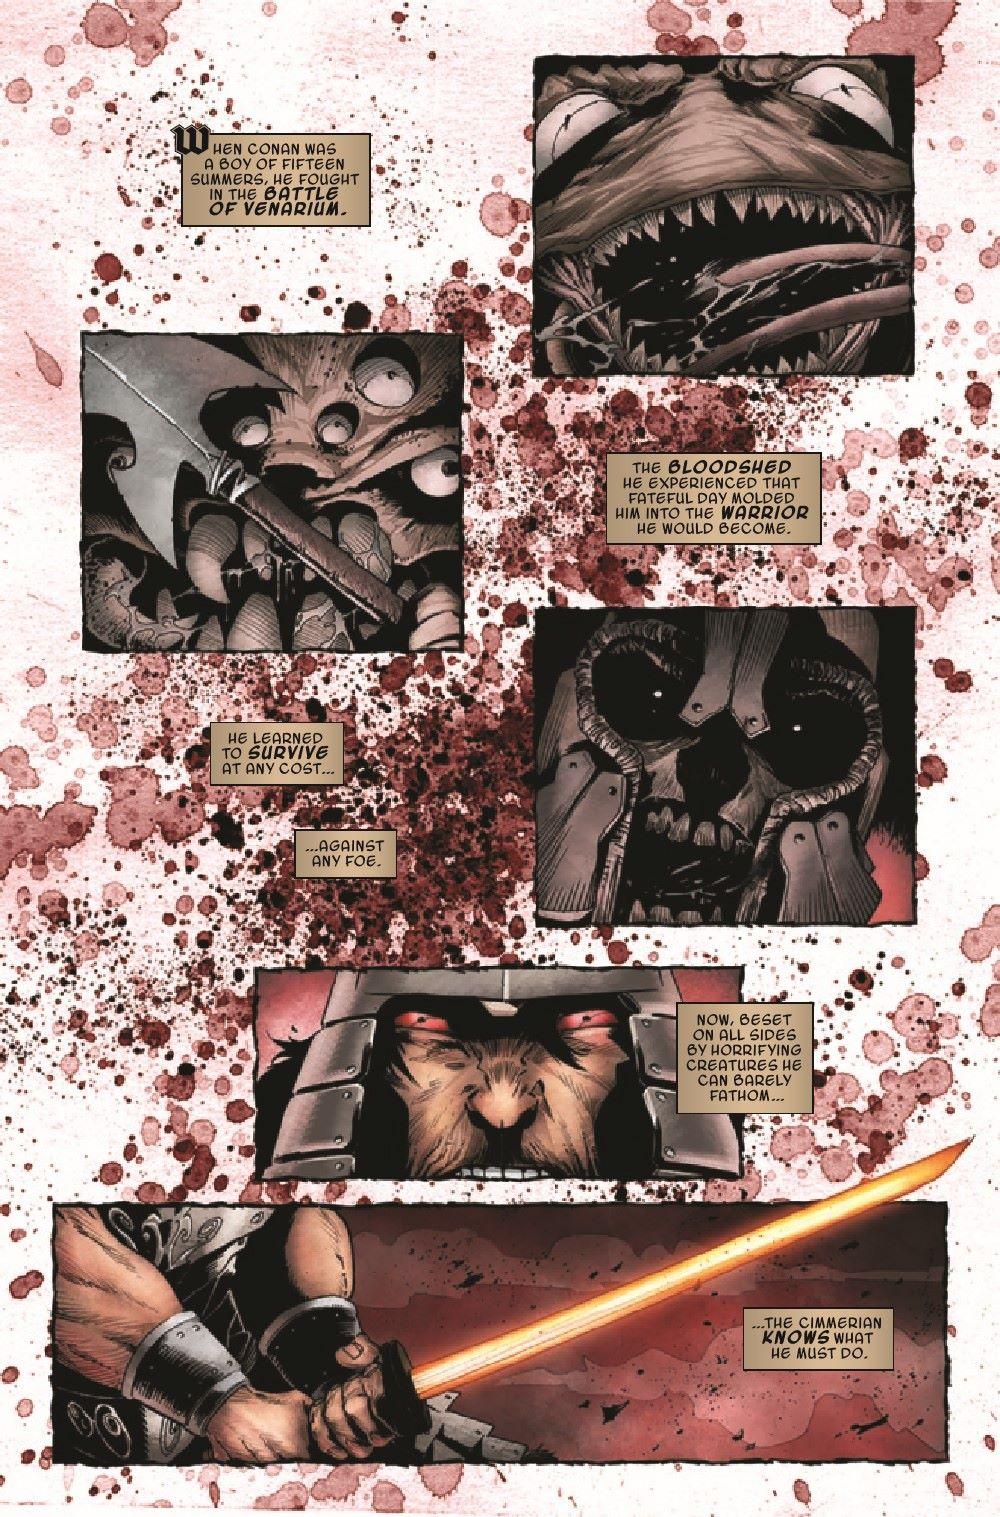 CONANBARB2019018_Preview-3 ComicList Previews: CONAN THE BARBARIAN #18